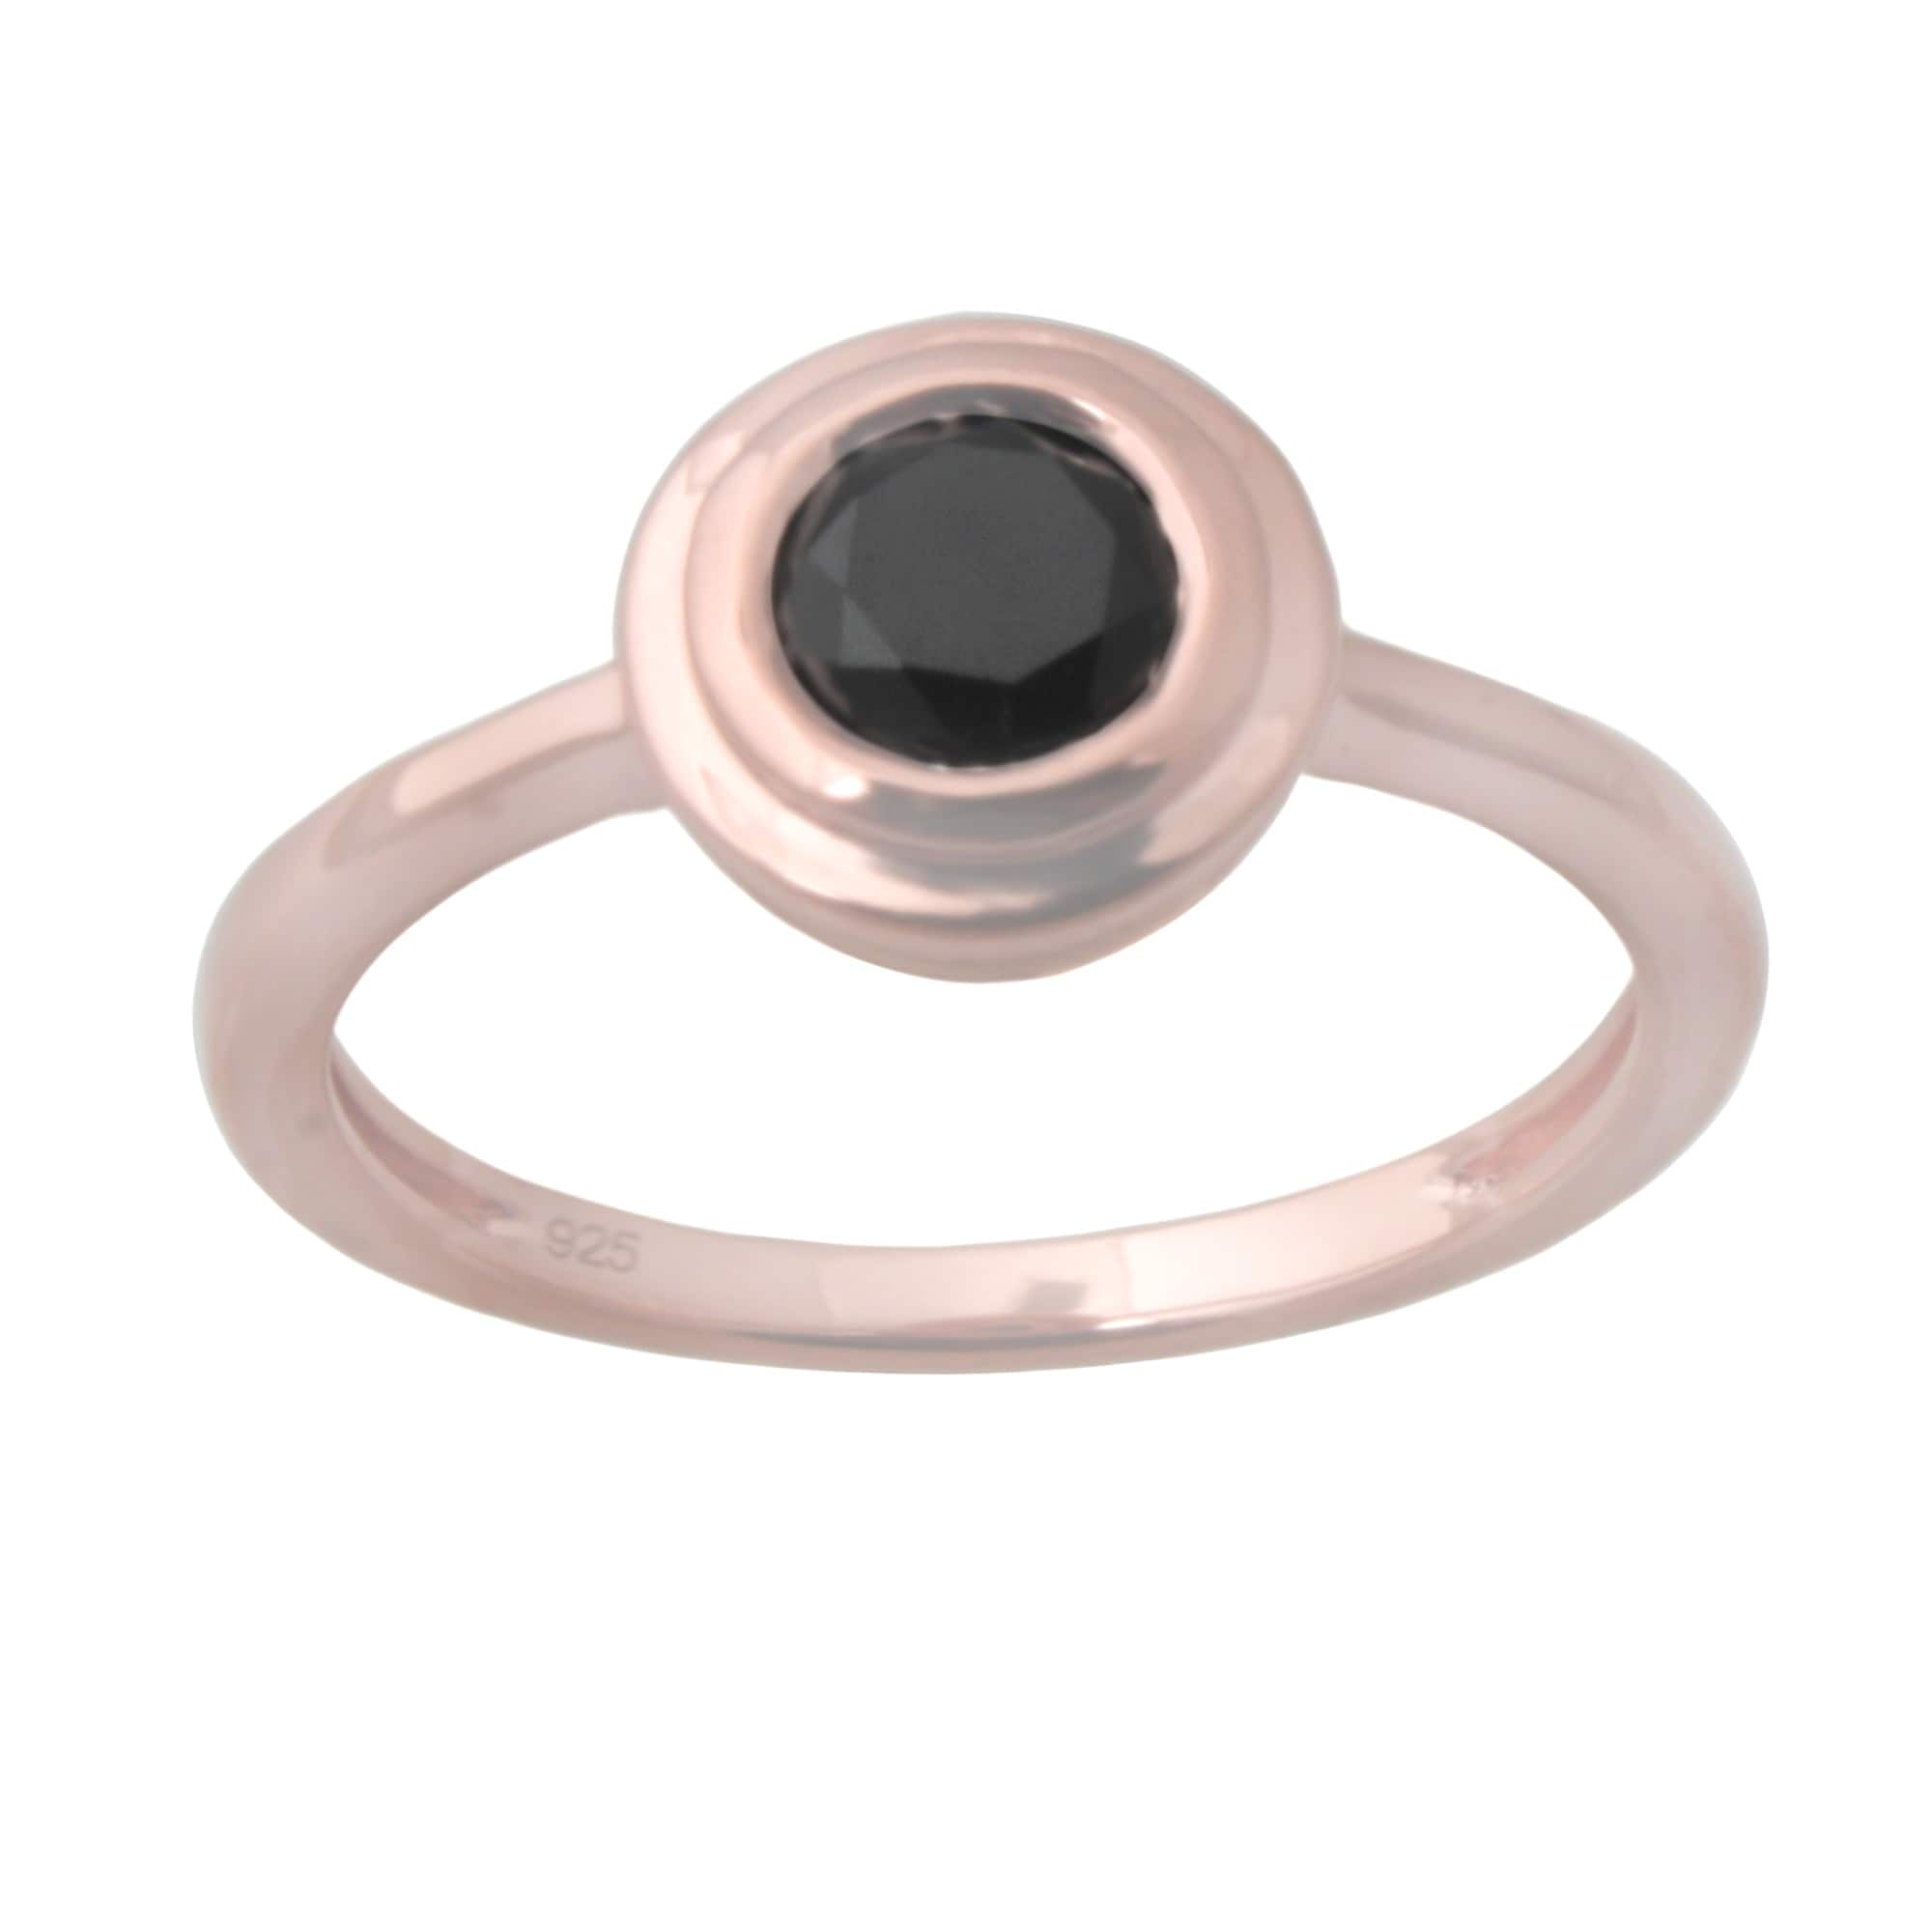 Prism Jewel 5.50MM 0.75CT Black Diamond Bezel Set Solitaire Engagement Ring - Thumbnail 0